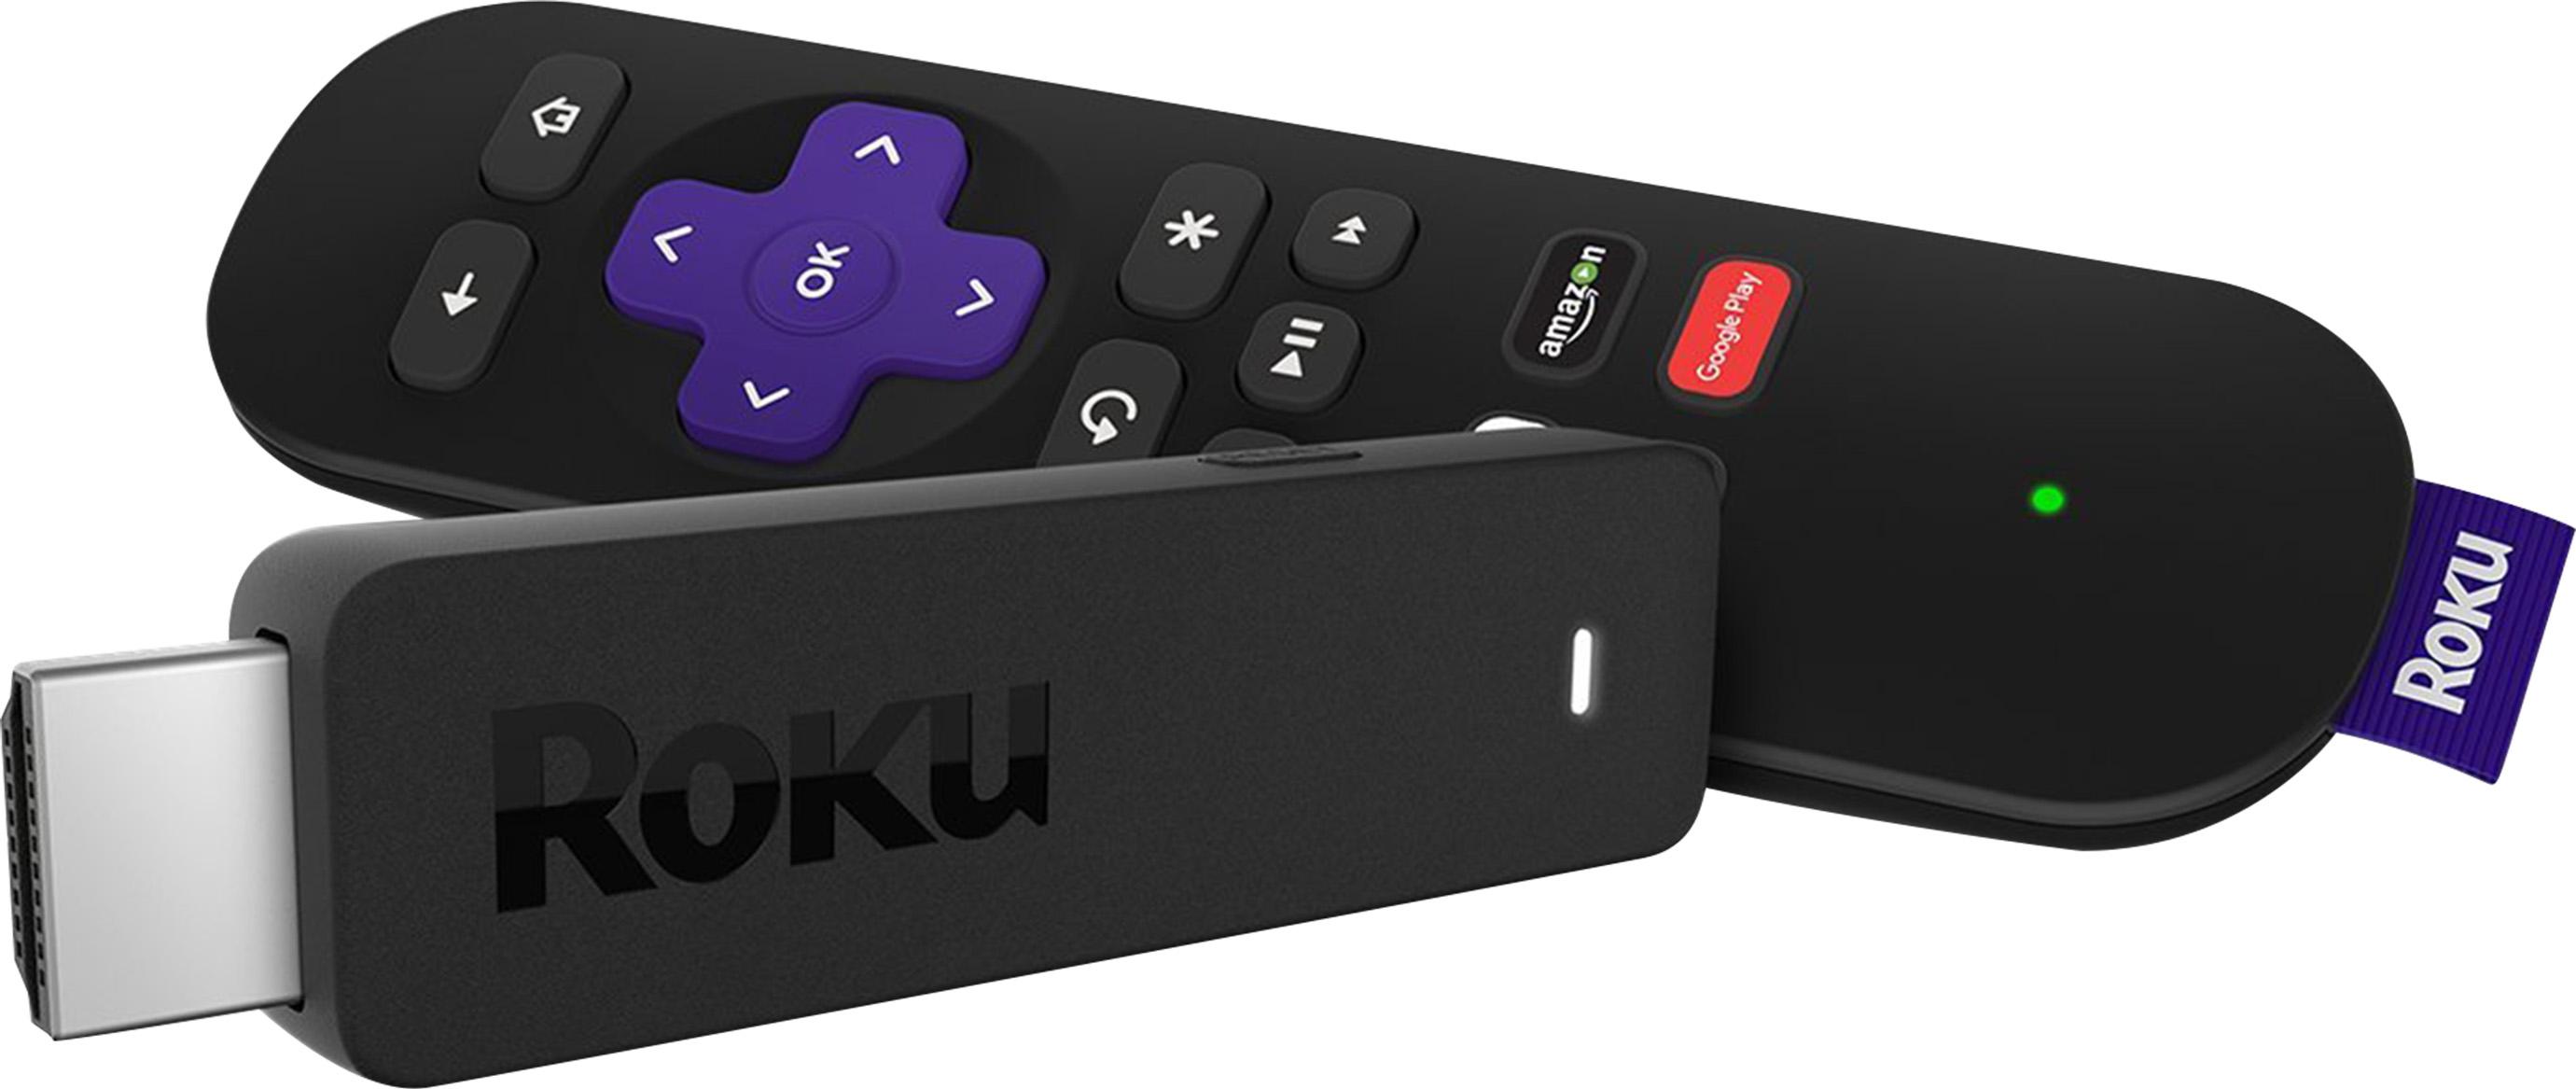 Roku Streaming Stick 3600R